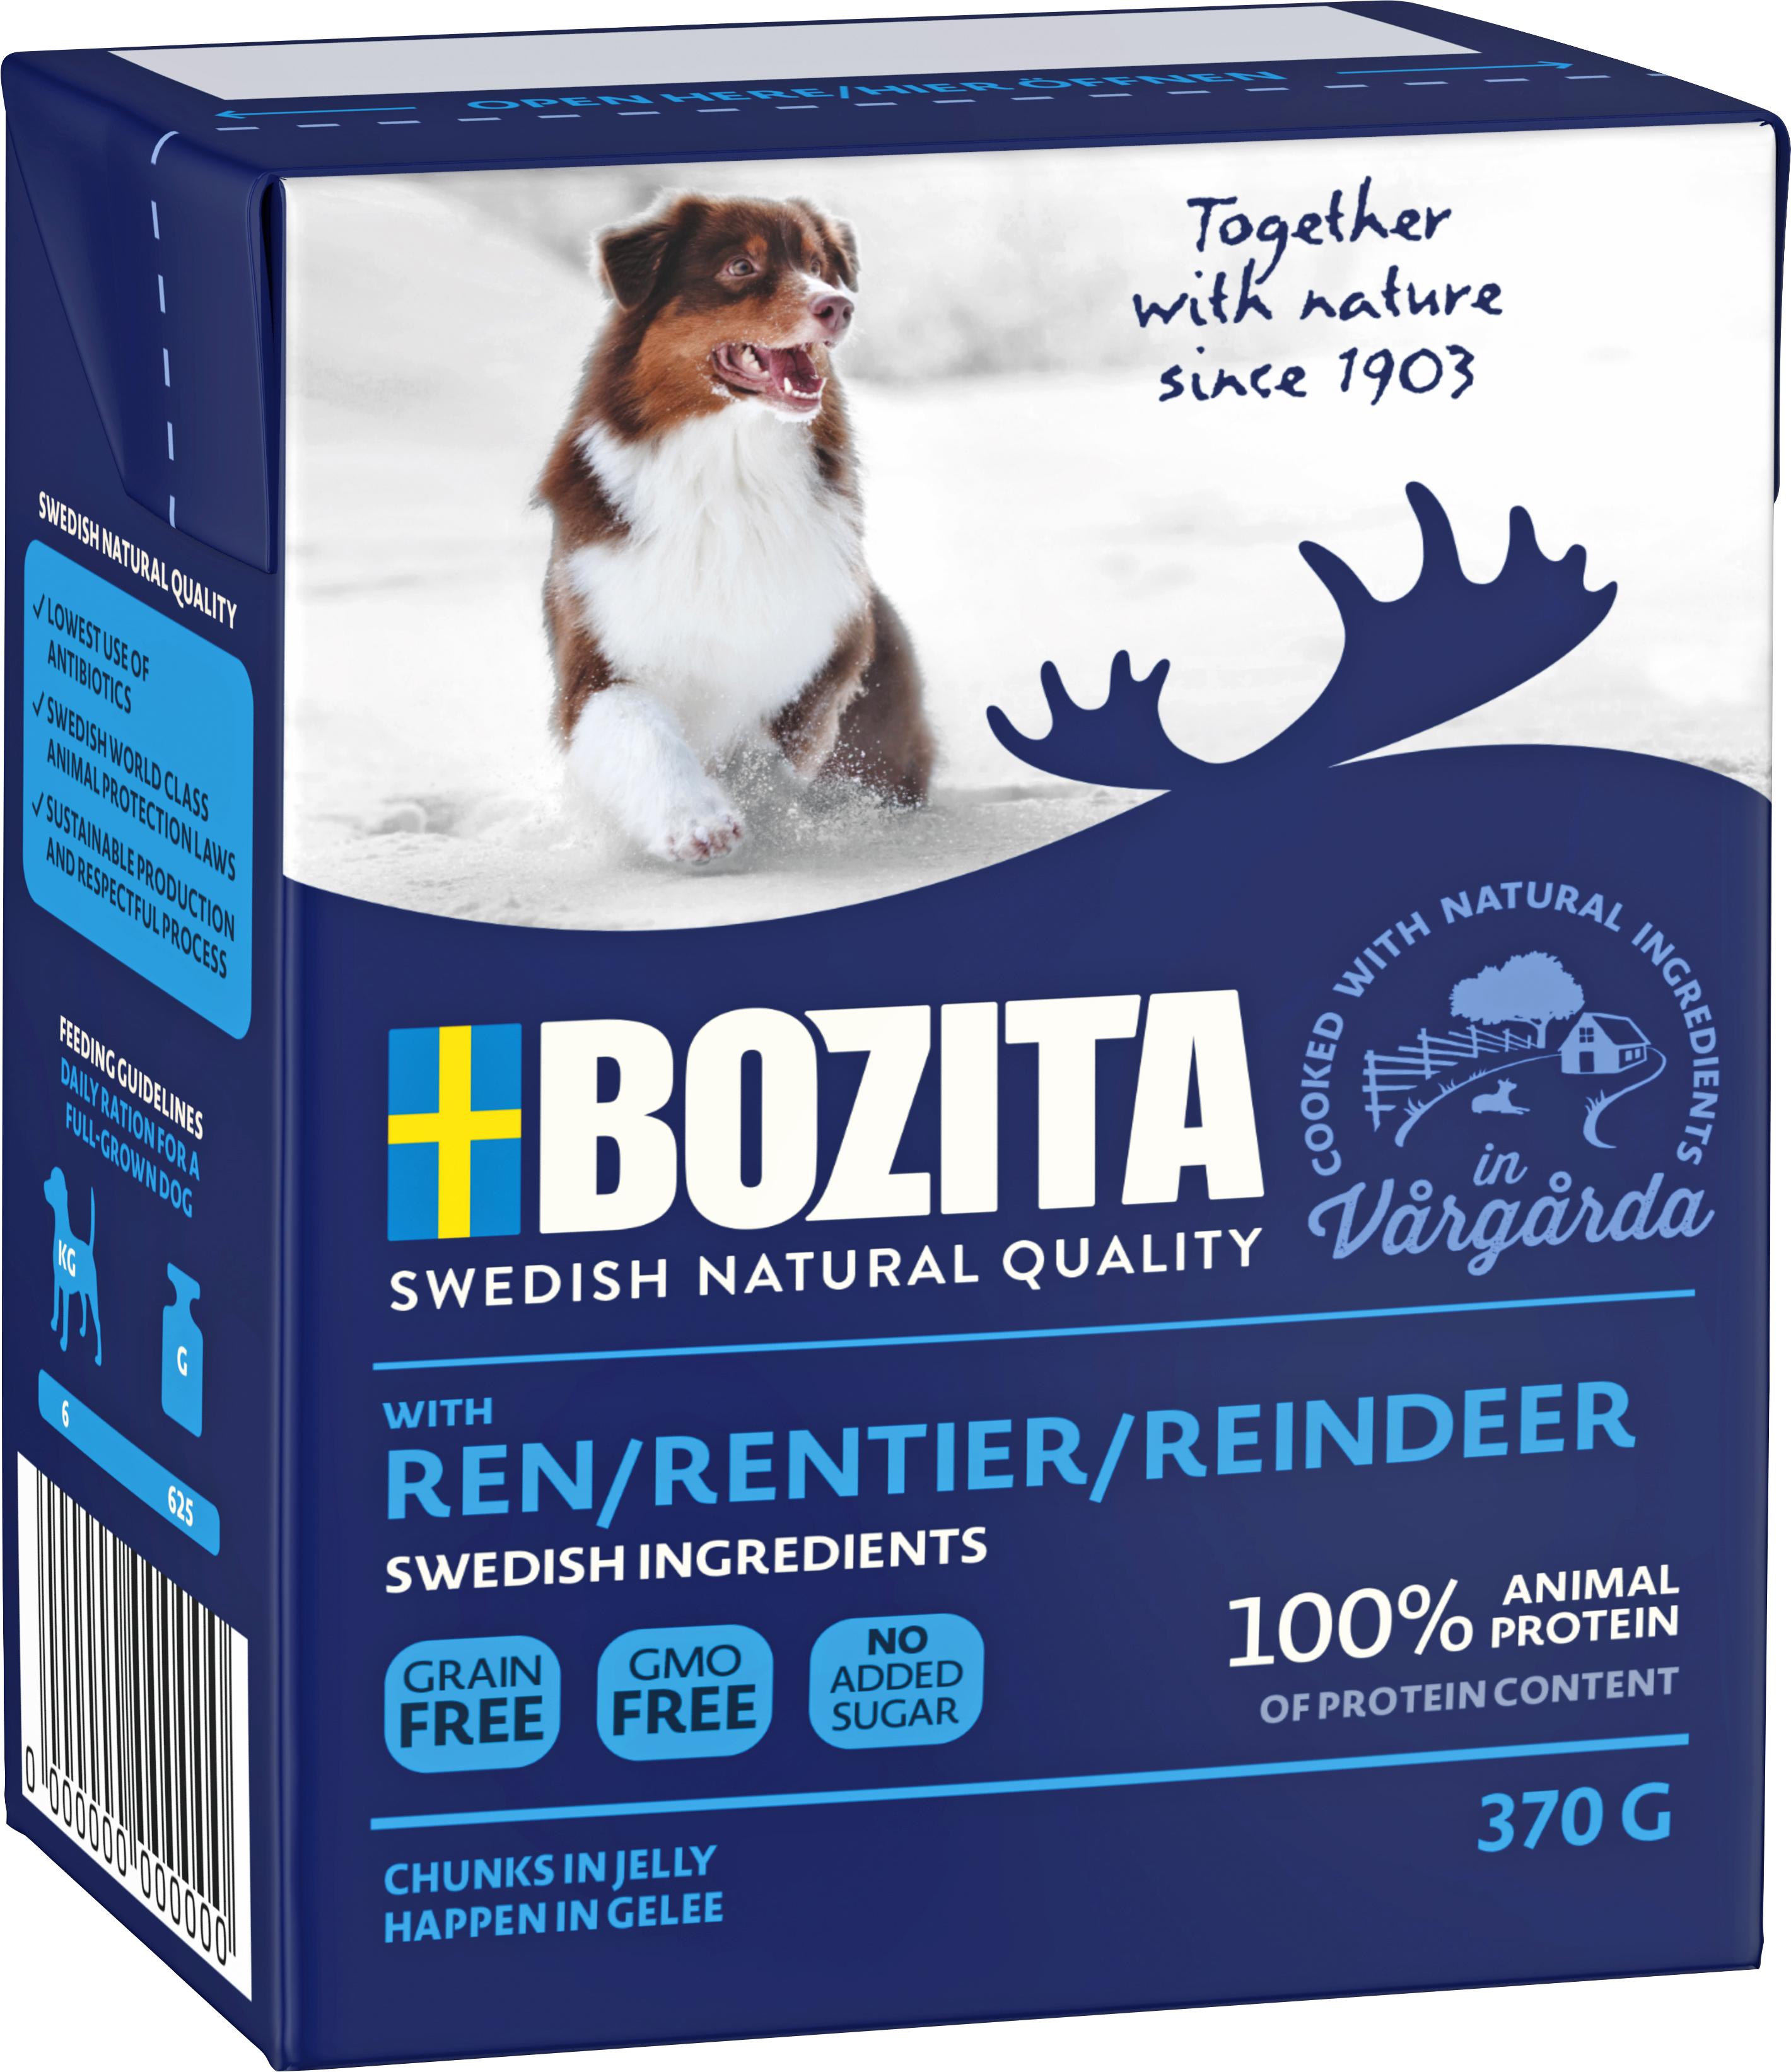 Hundfoder Bozita Tetra Recart Ren, 370 g